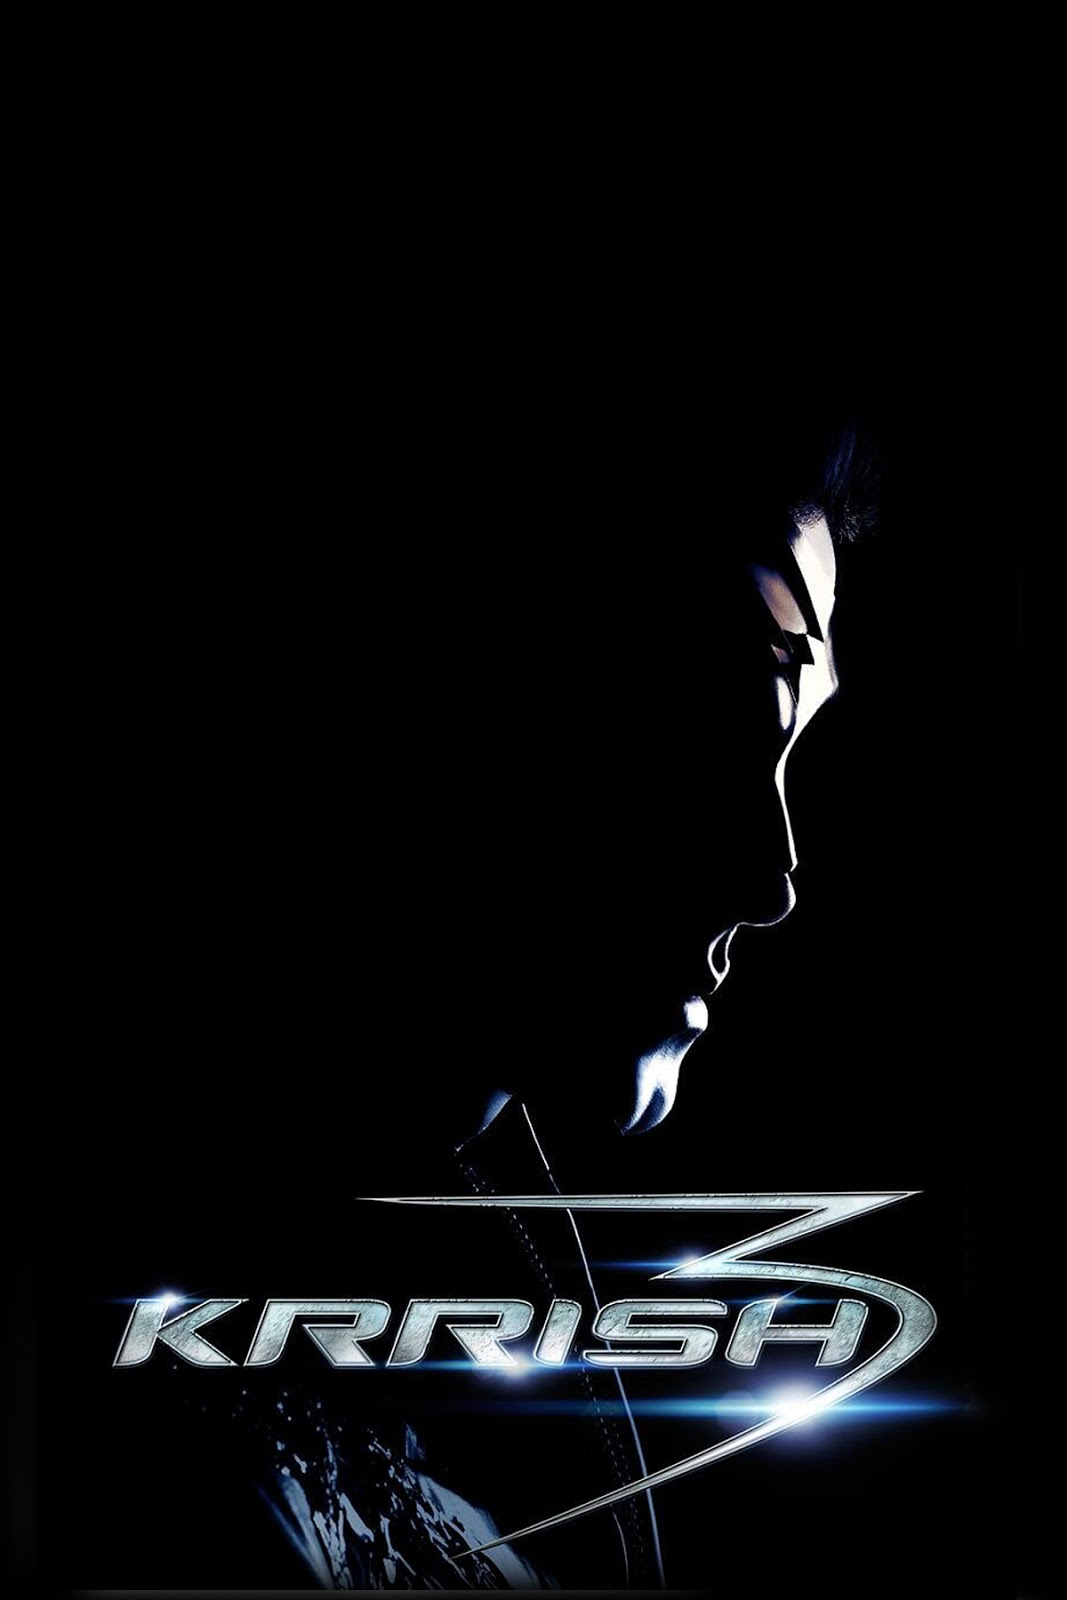 Krrish-3 Latest HD wallpapers 1080p